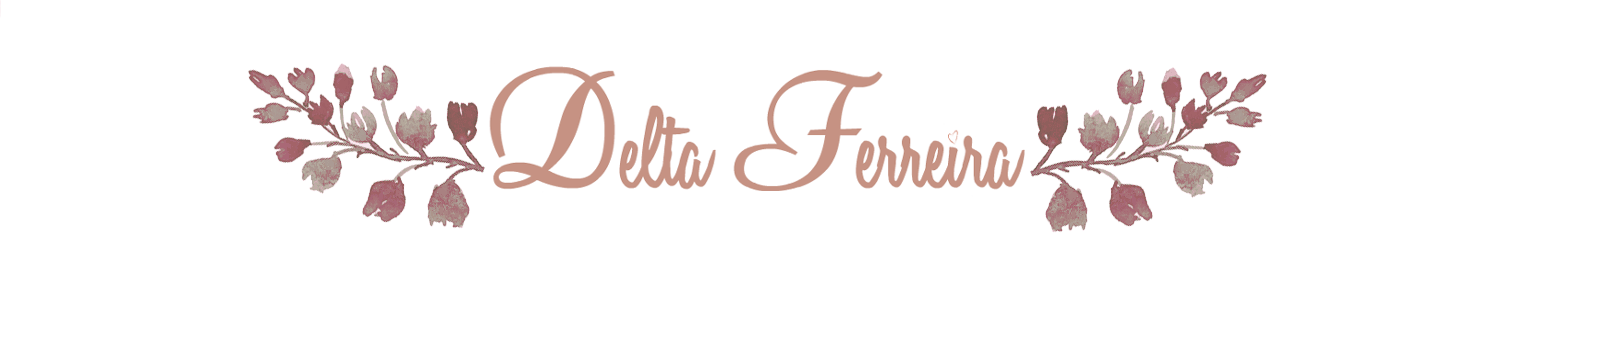 Delta Ferreira